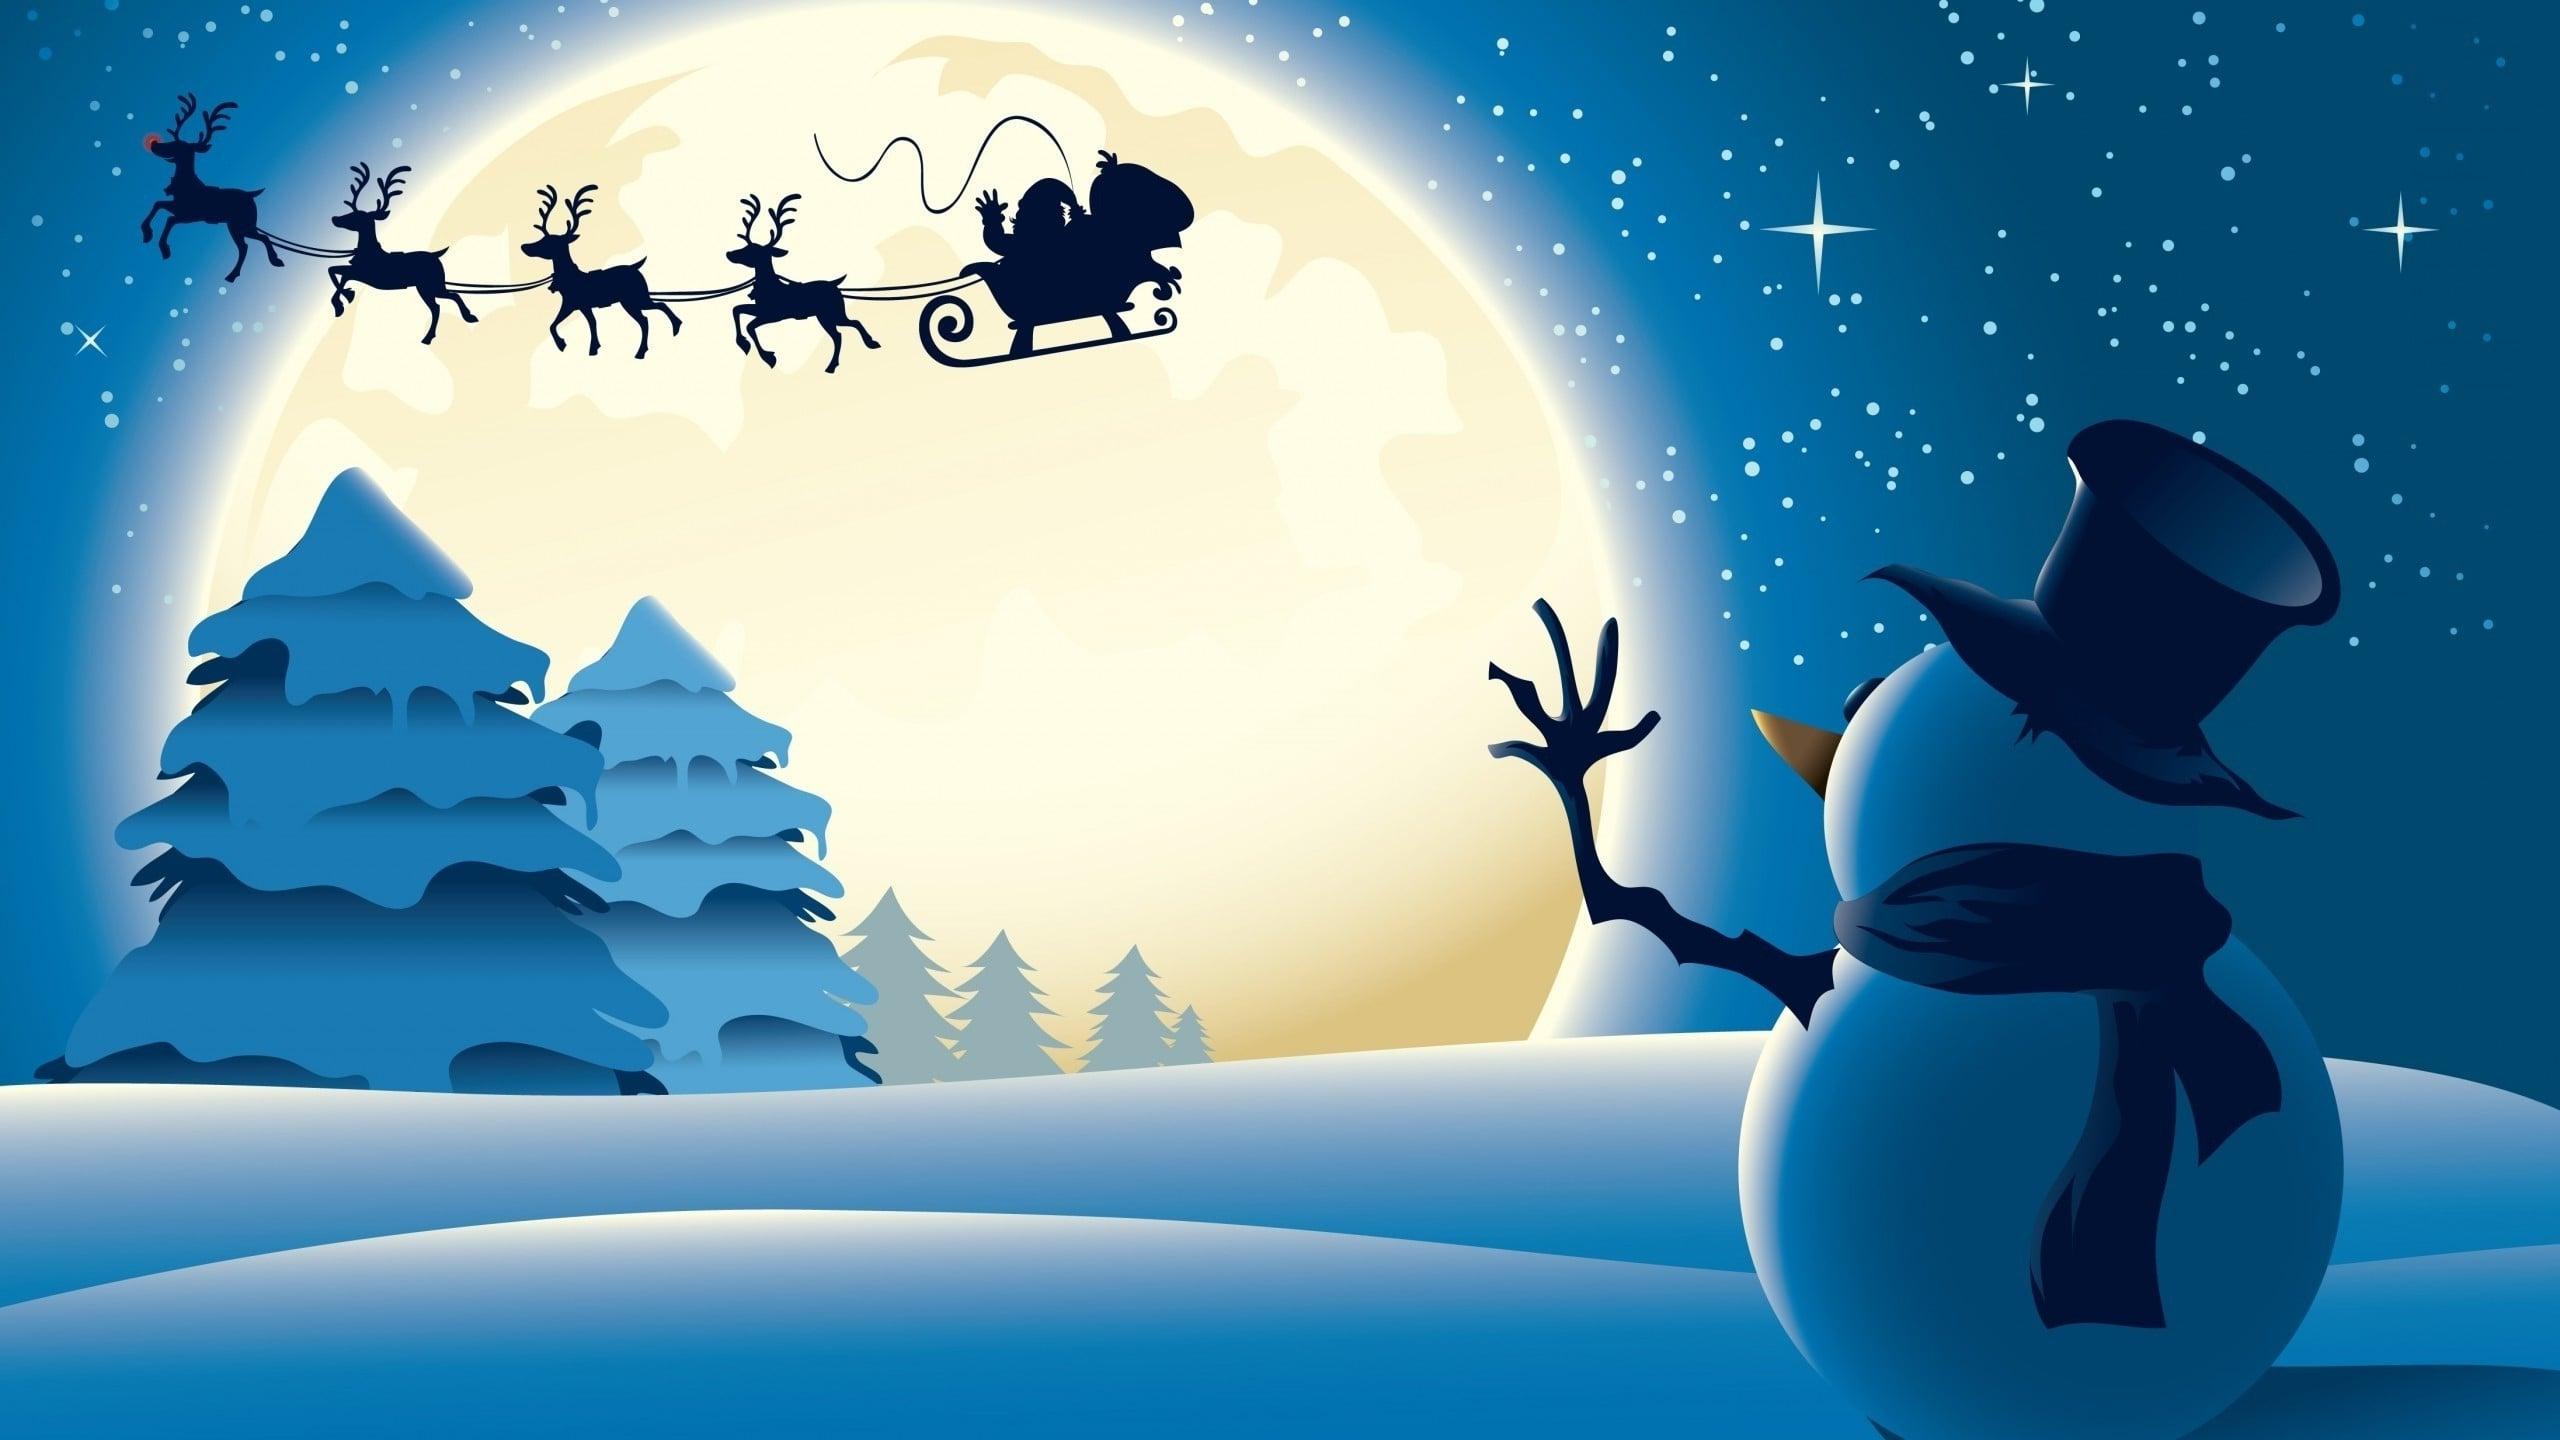 christmas-Santa-Claus-The-Reindeer-Sleigh-Rider-of-Sky